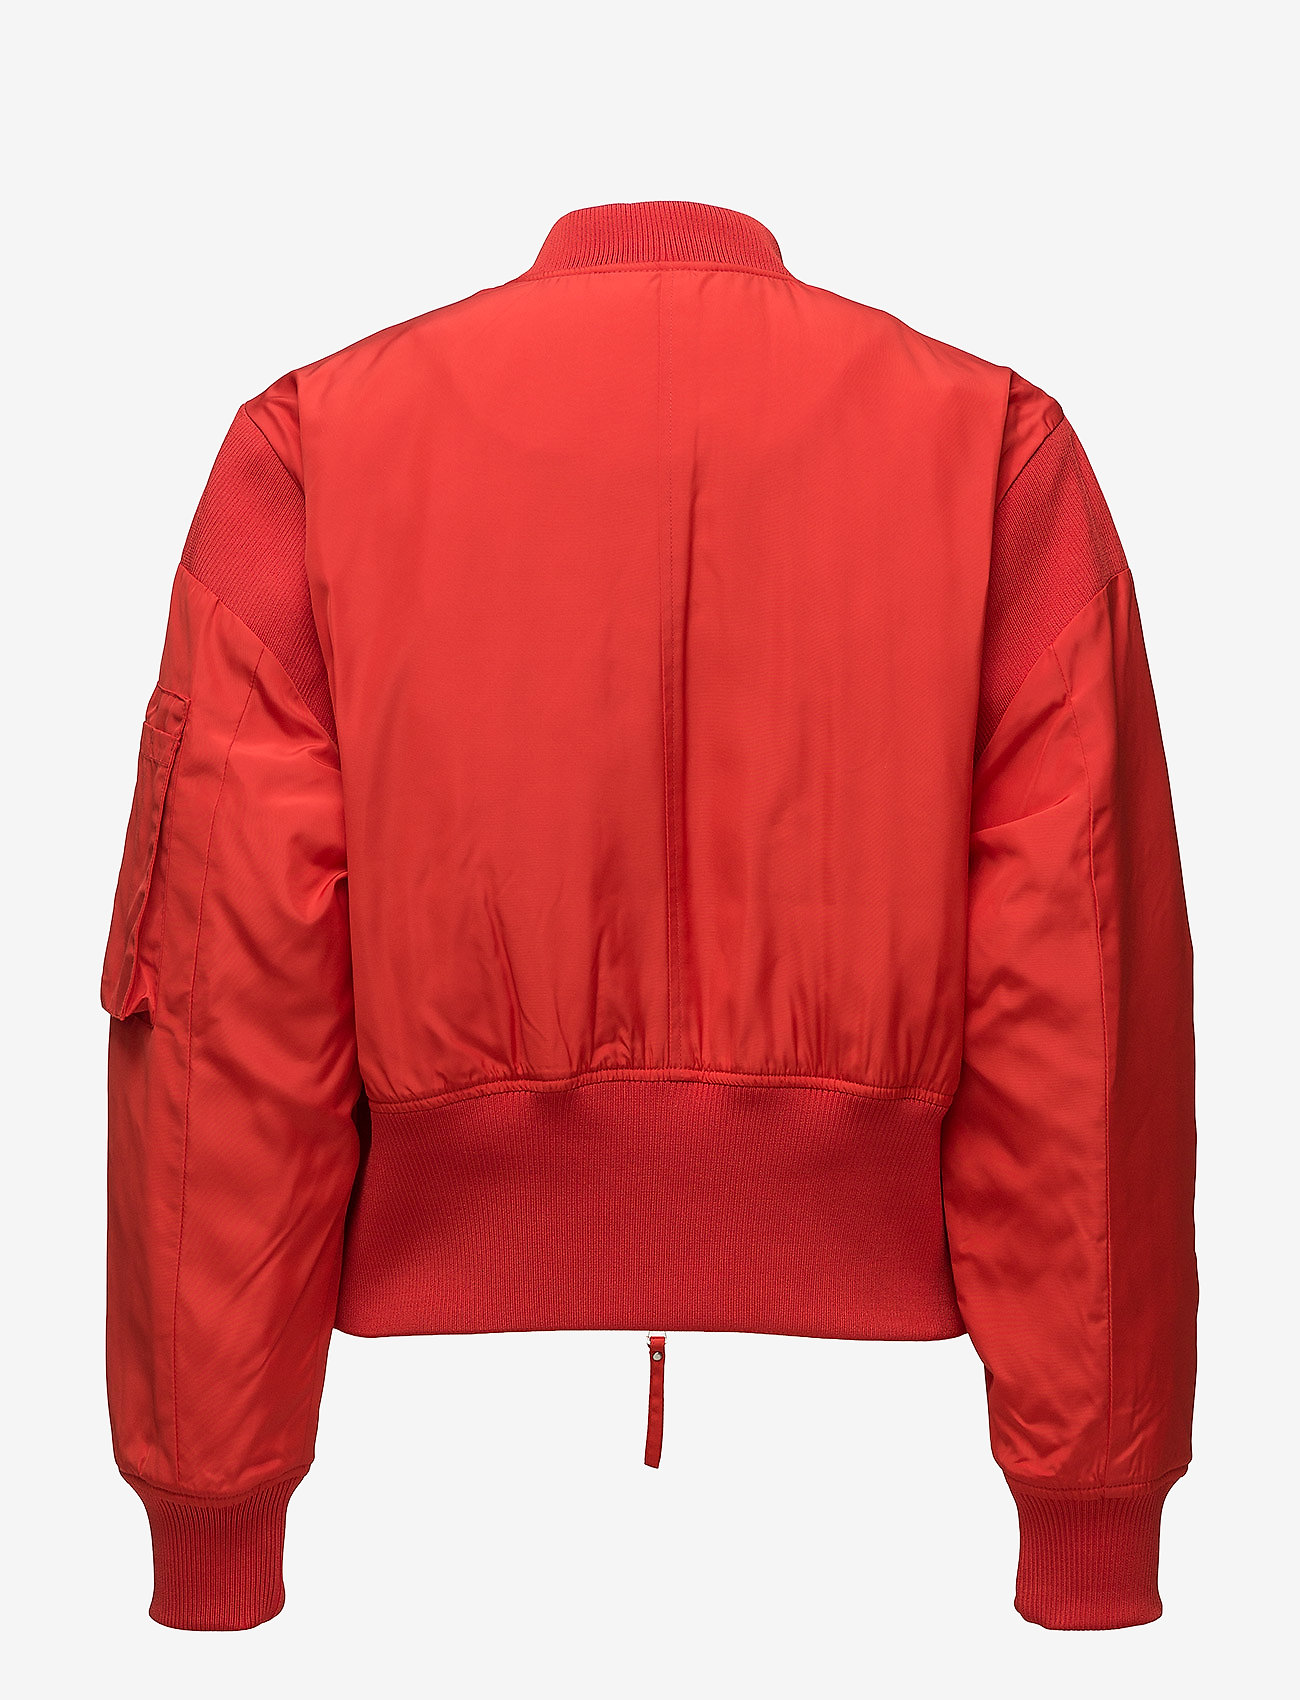 Collin Bomber (Red) (1469 kr) - DESIGNERS, REMIX